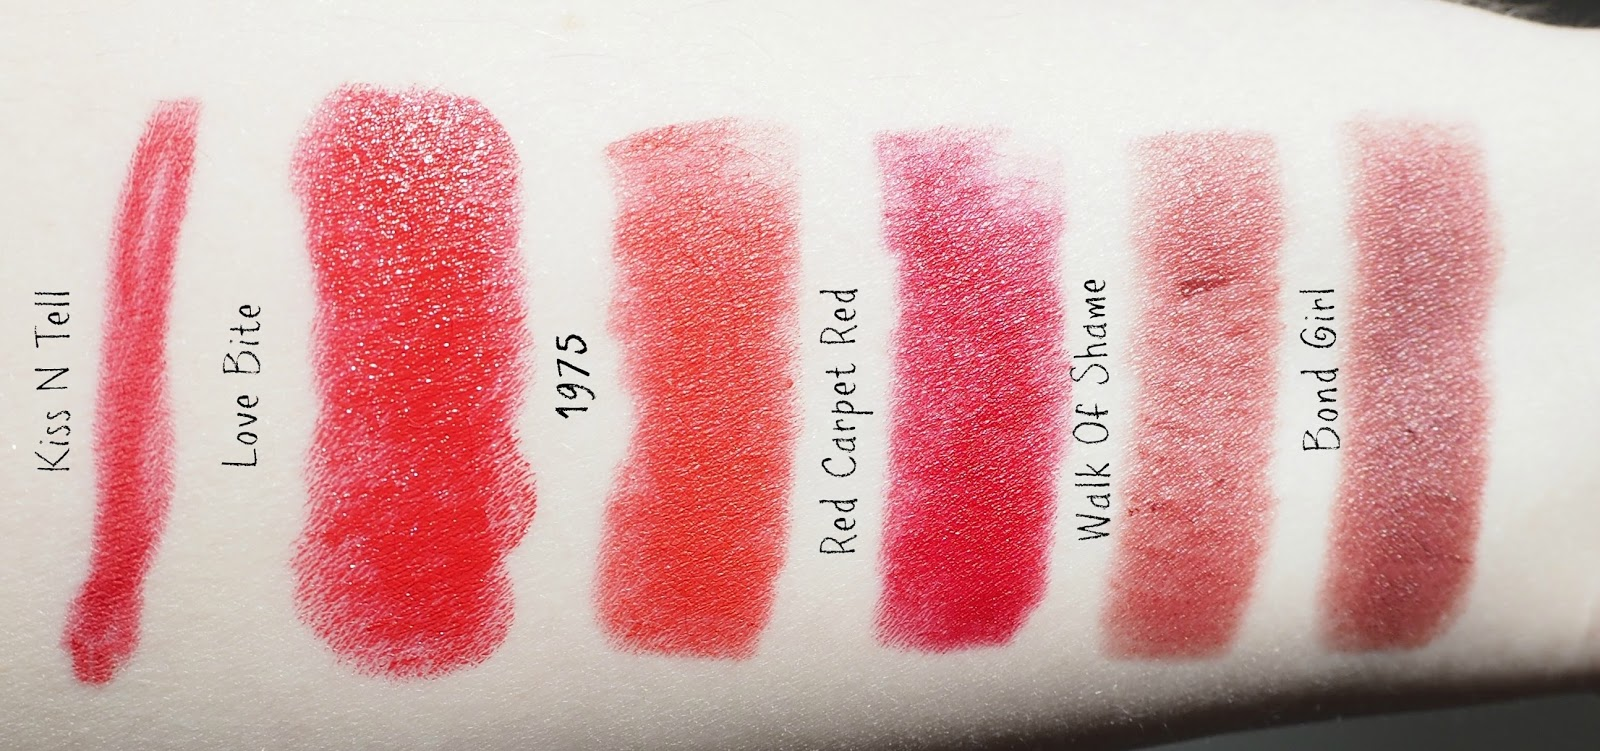 Charlotte Tilbury lipstick swatches